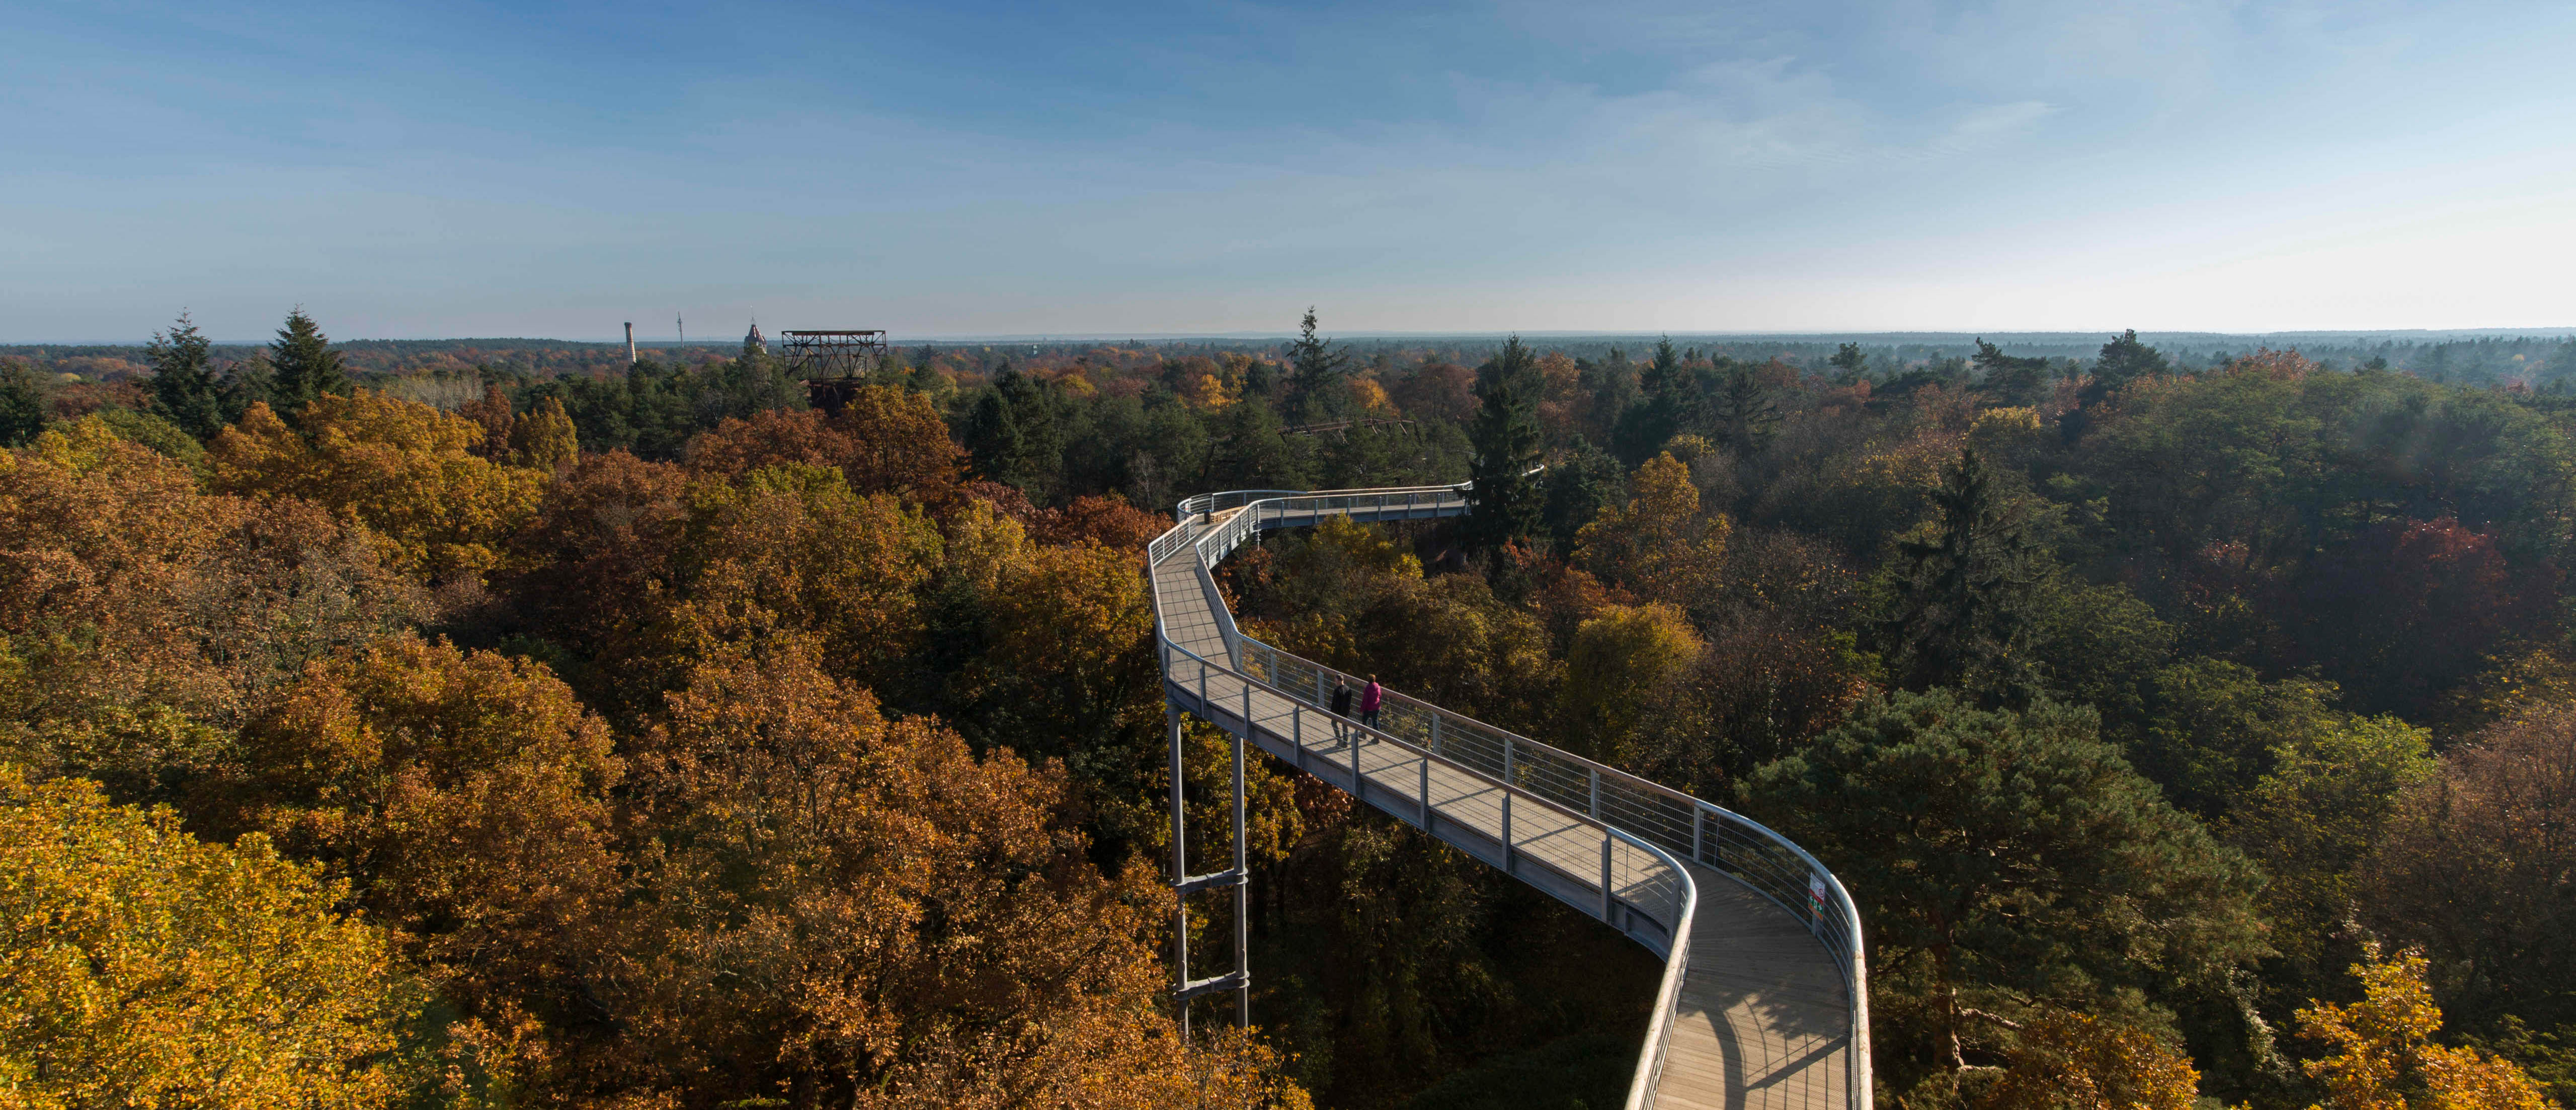 Herbstlicher Baumkronenpfad in Beelitz-Heilstätten